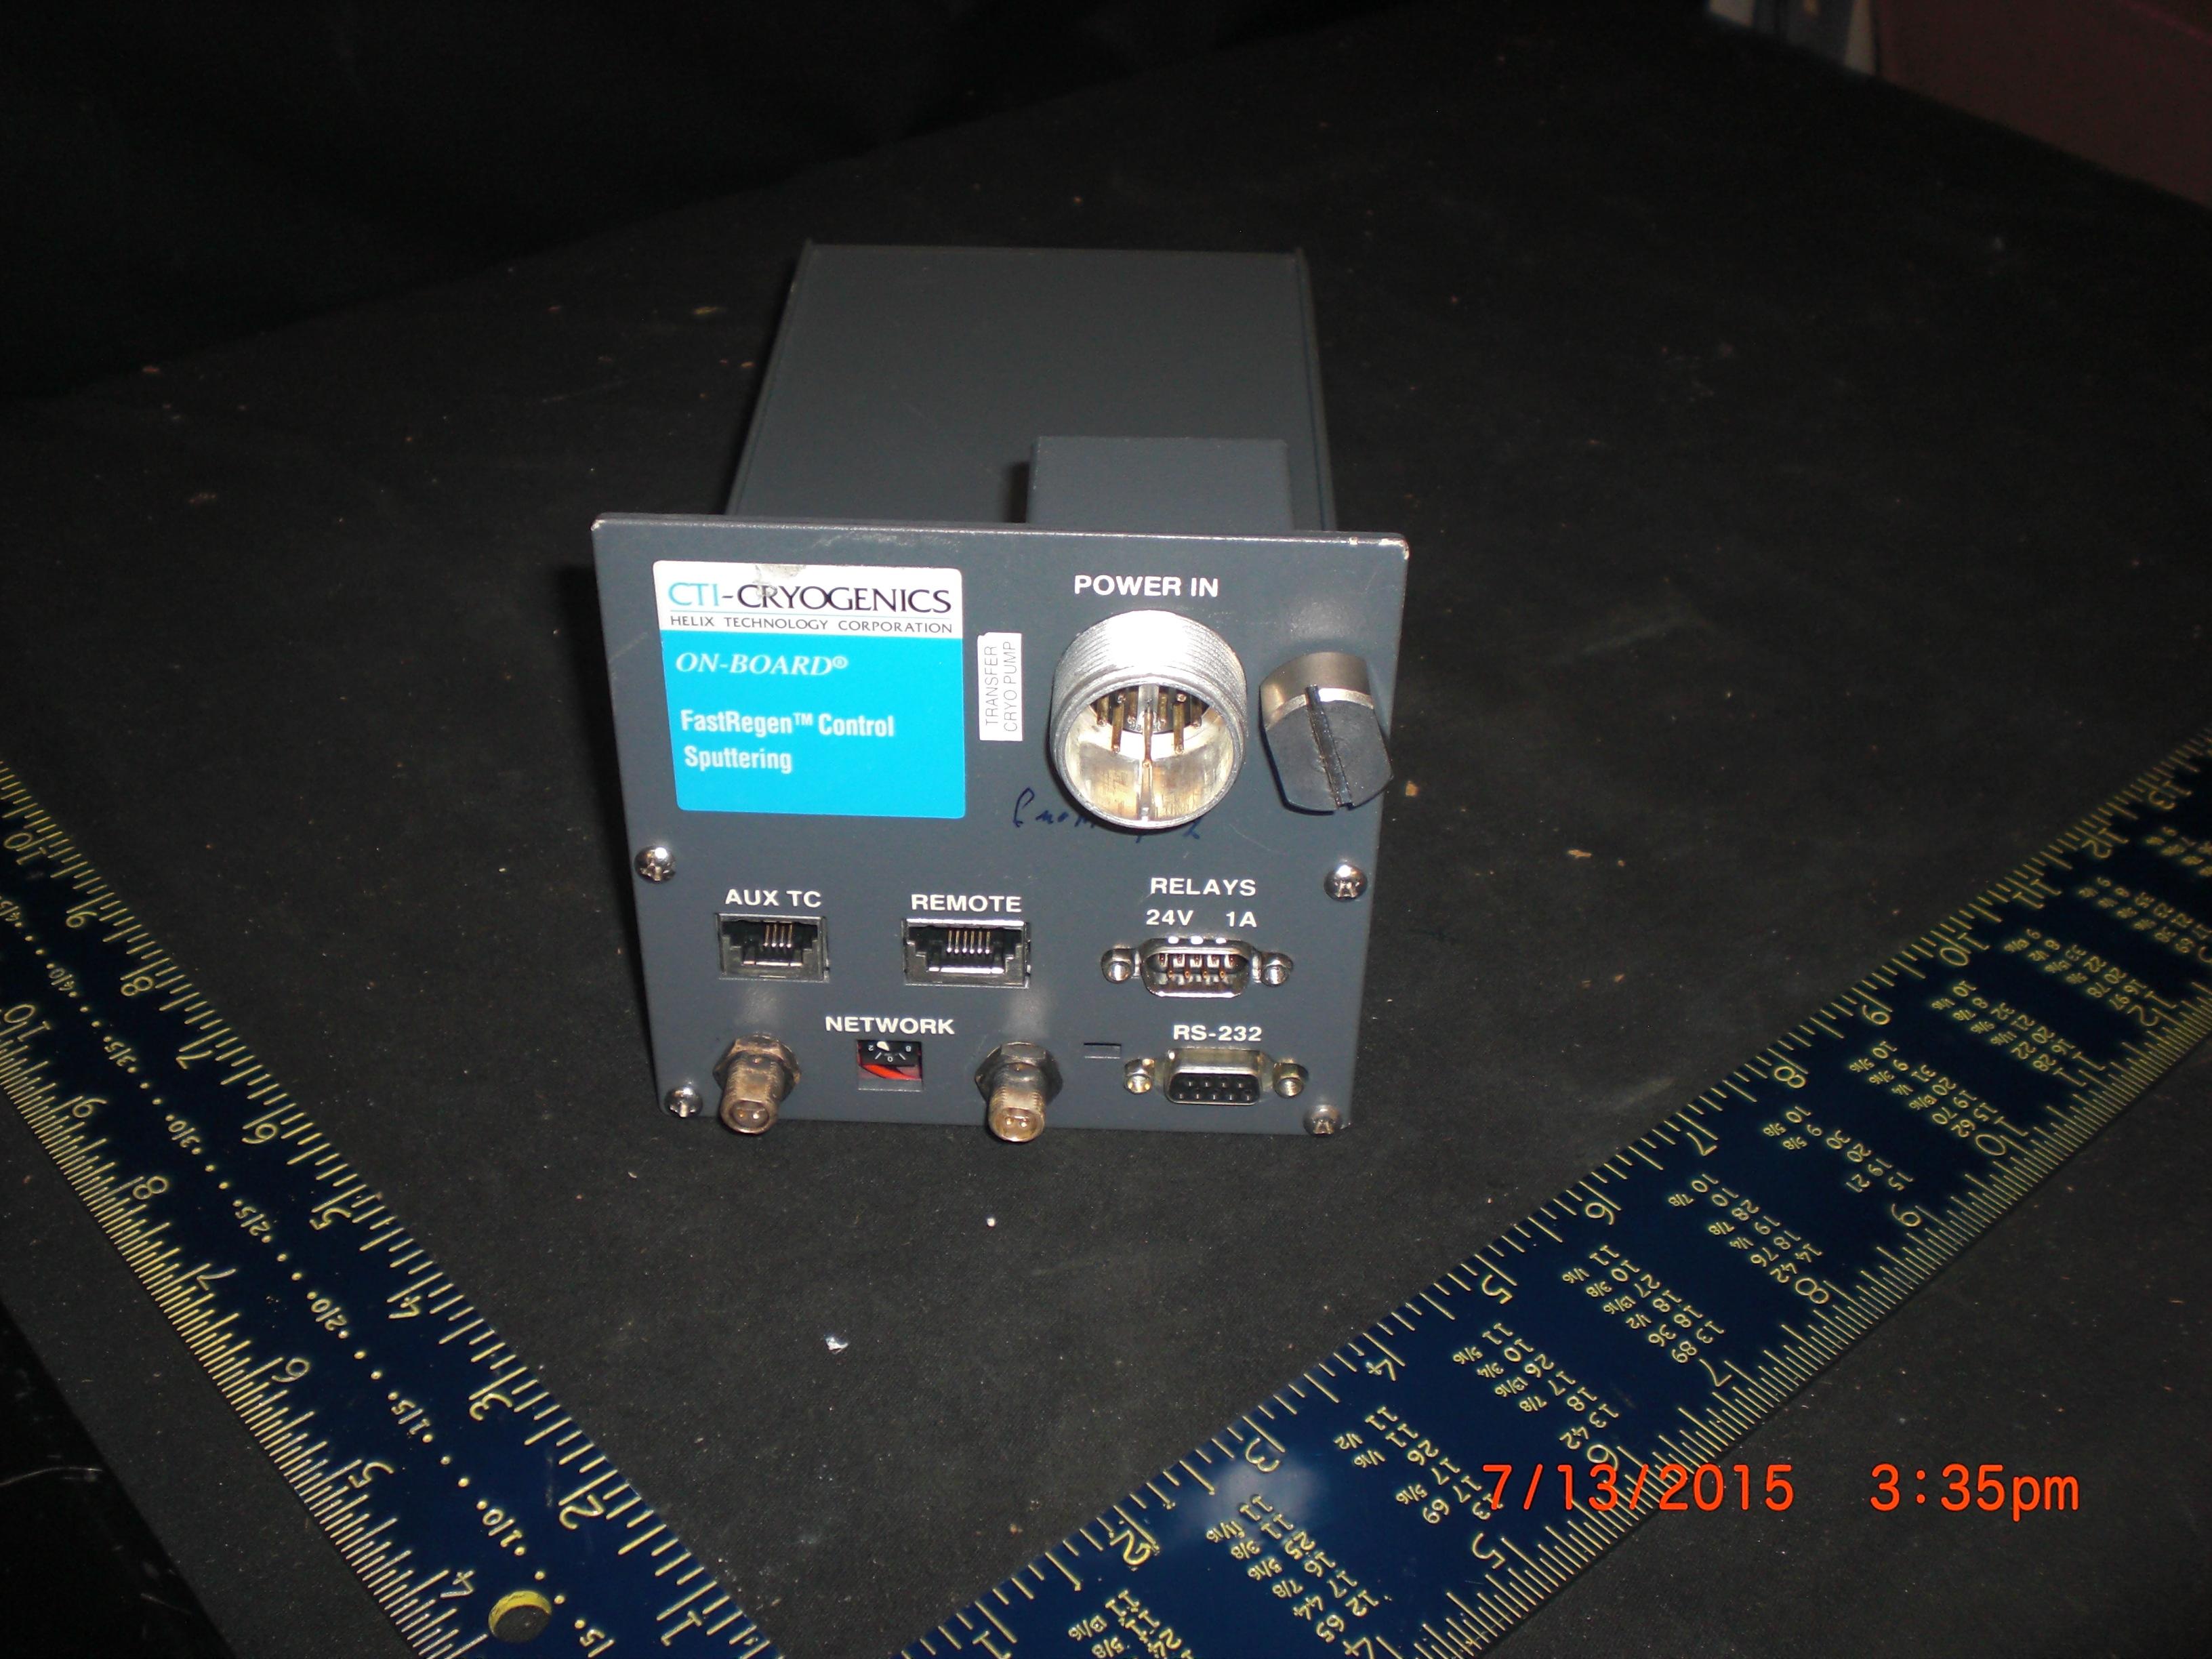 Cryogenics  CTI-CRYGENICS 8113036G001 On-Board Module FastRegen Control Sputtering